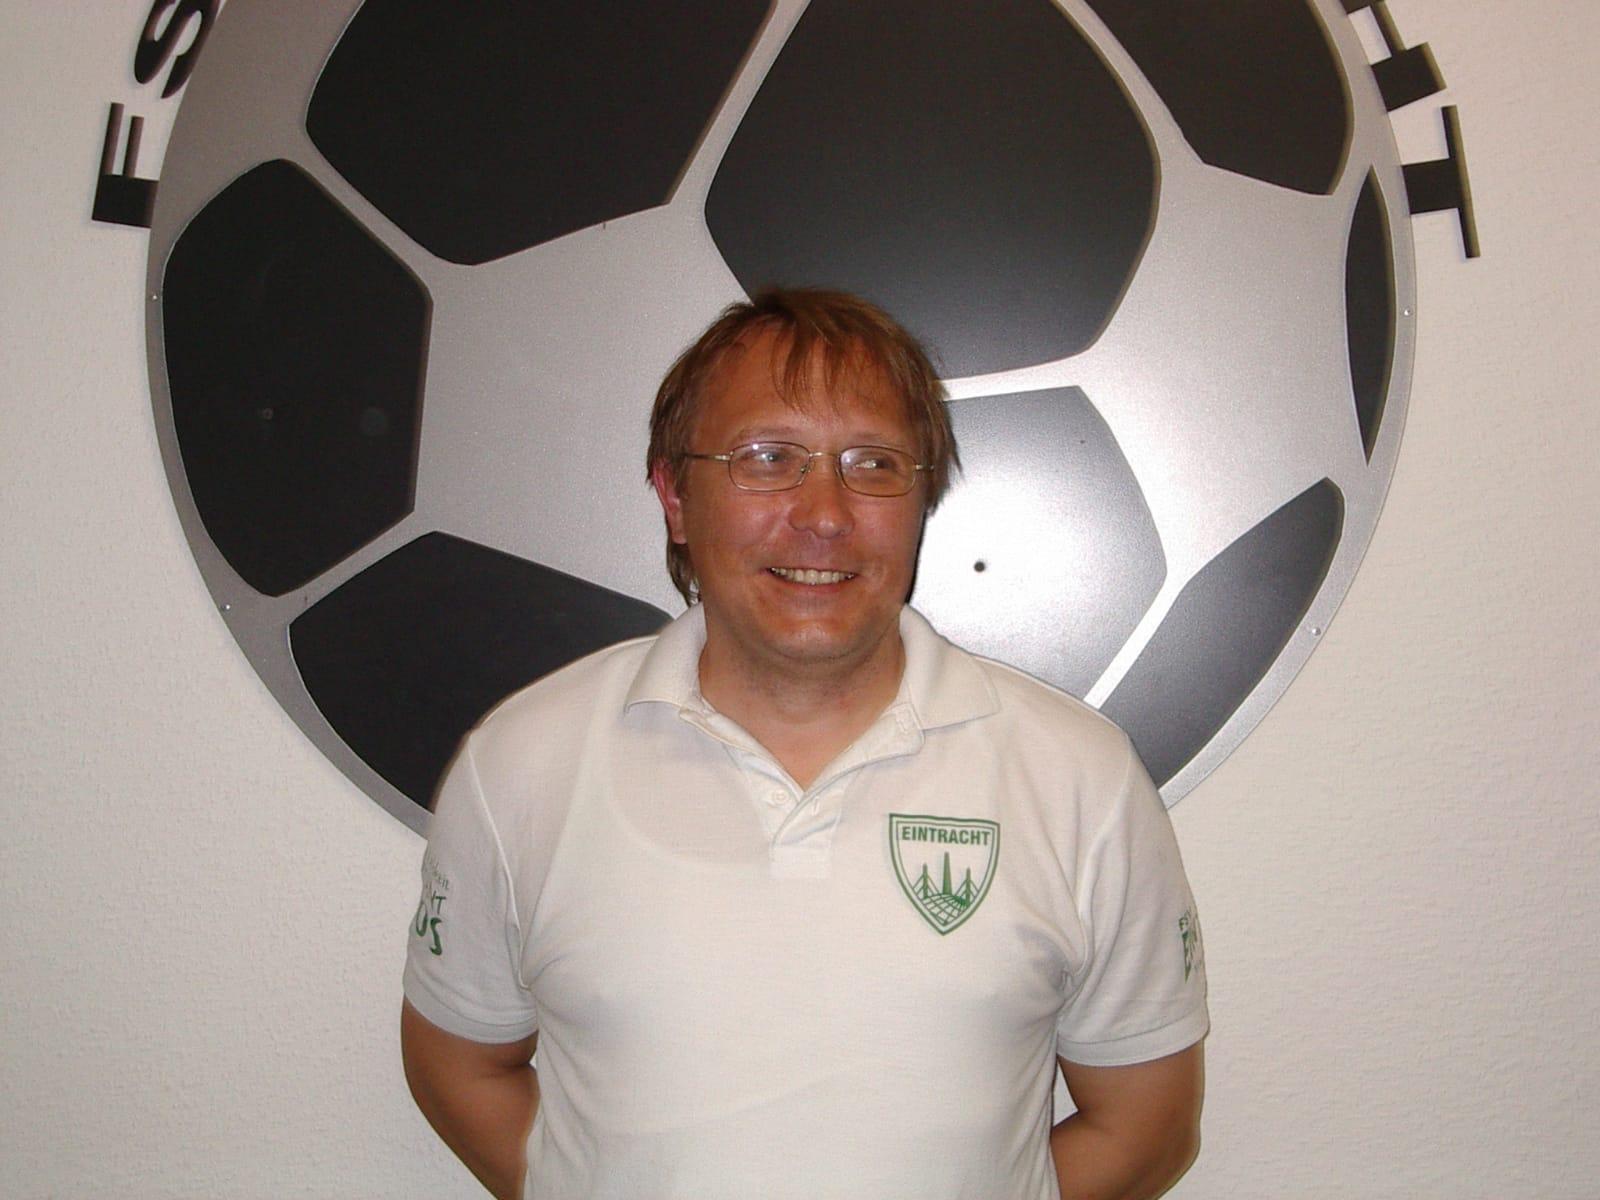 Frank Roder